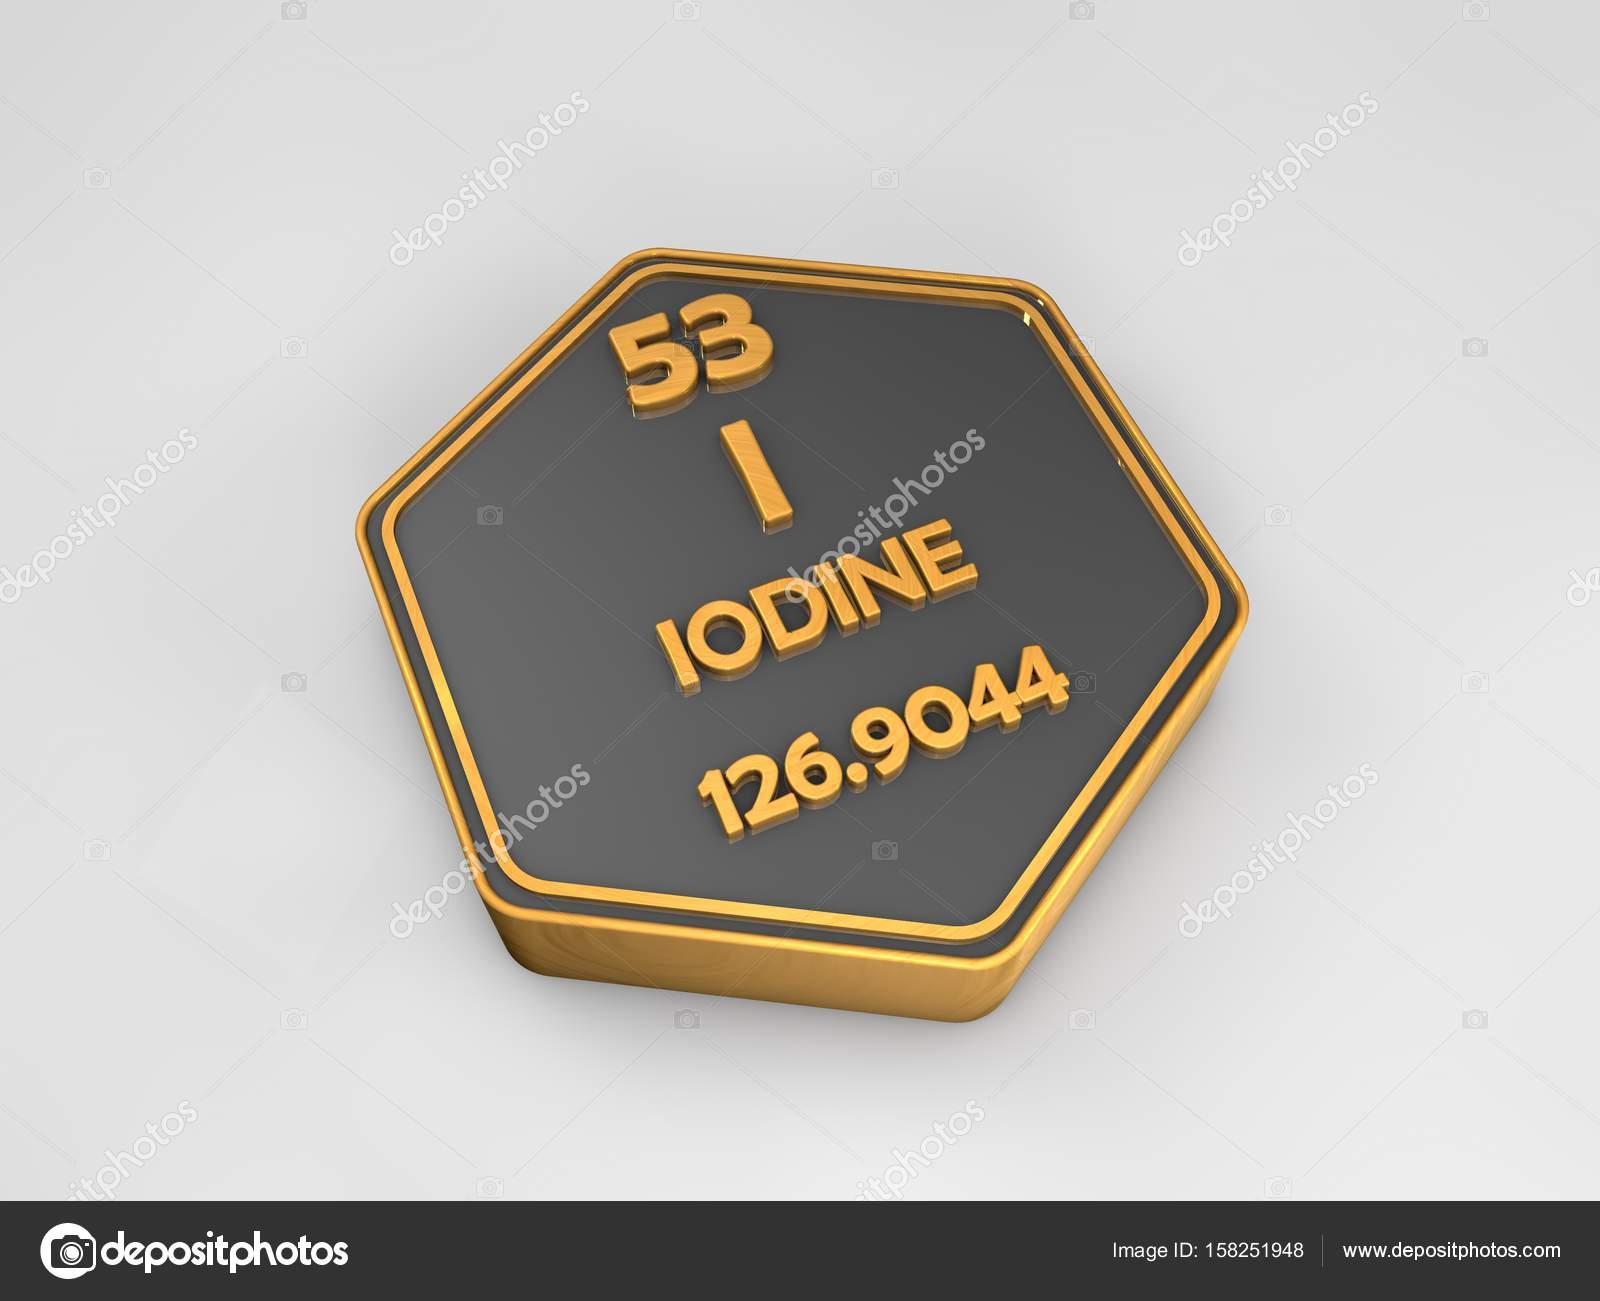 Yodo i elemento qumico tabla peridica forma hexagonal 3d yodo i elemento qumico tabla peridica forma hexagonal 3d render foto de stock urtaz Image collections